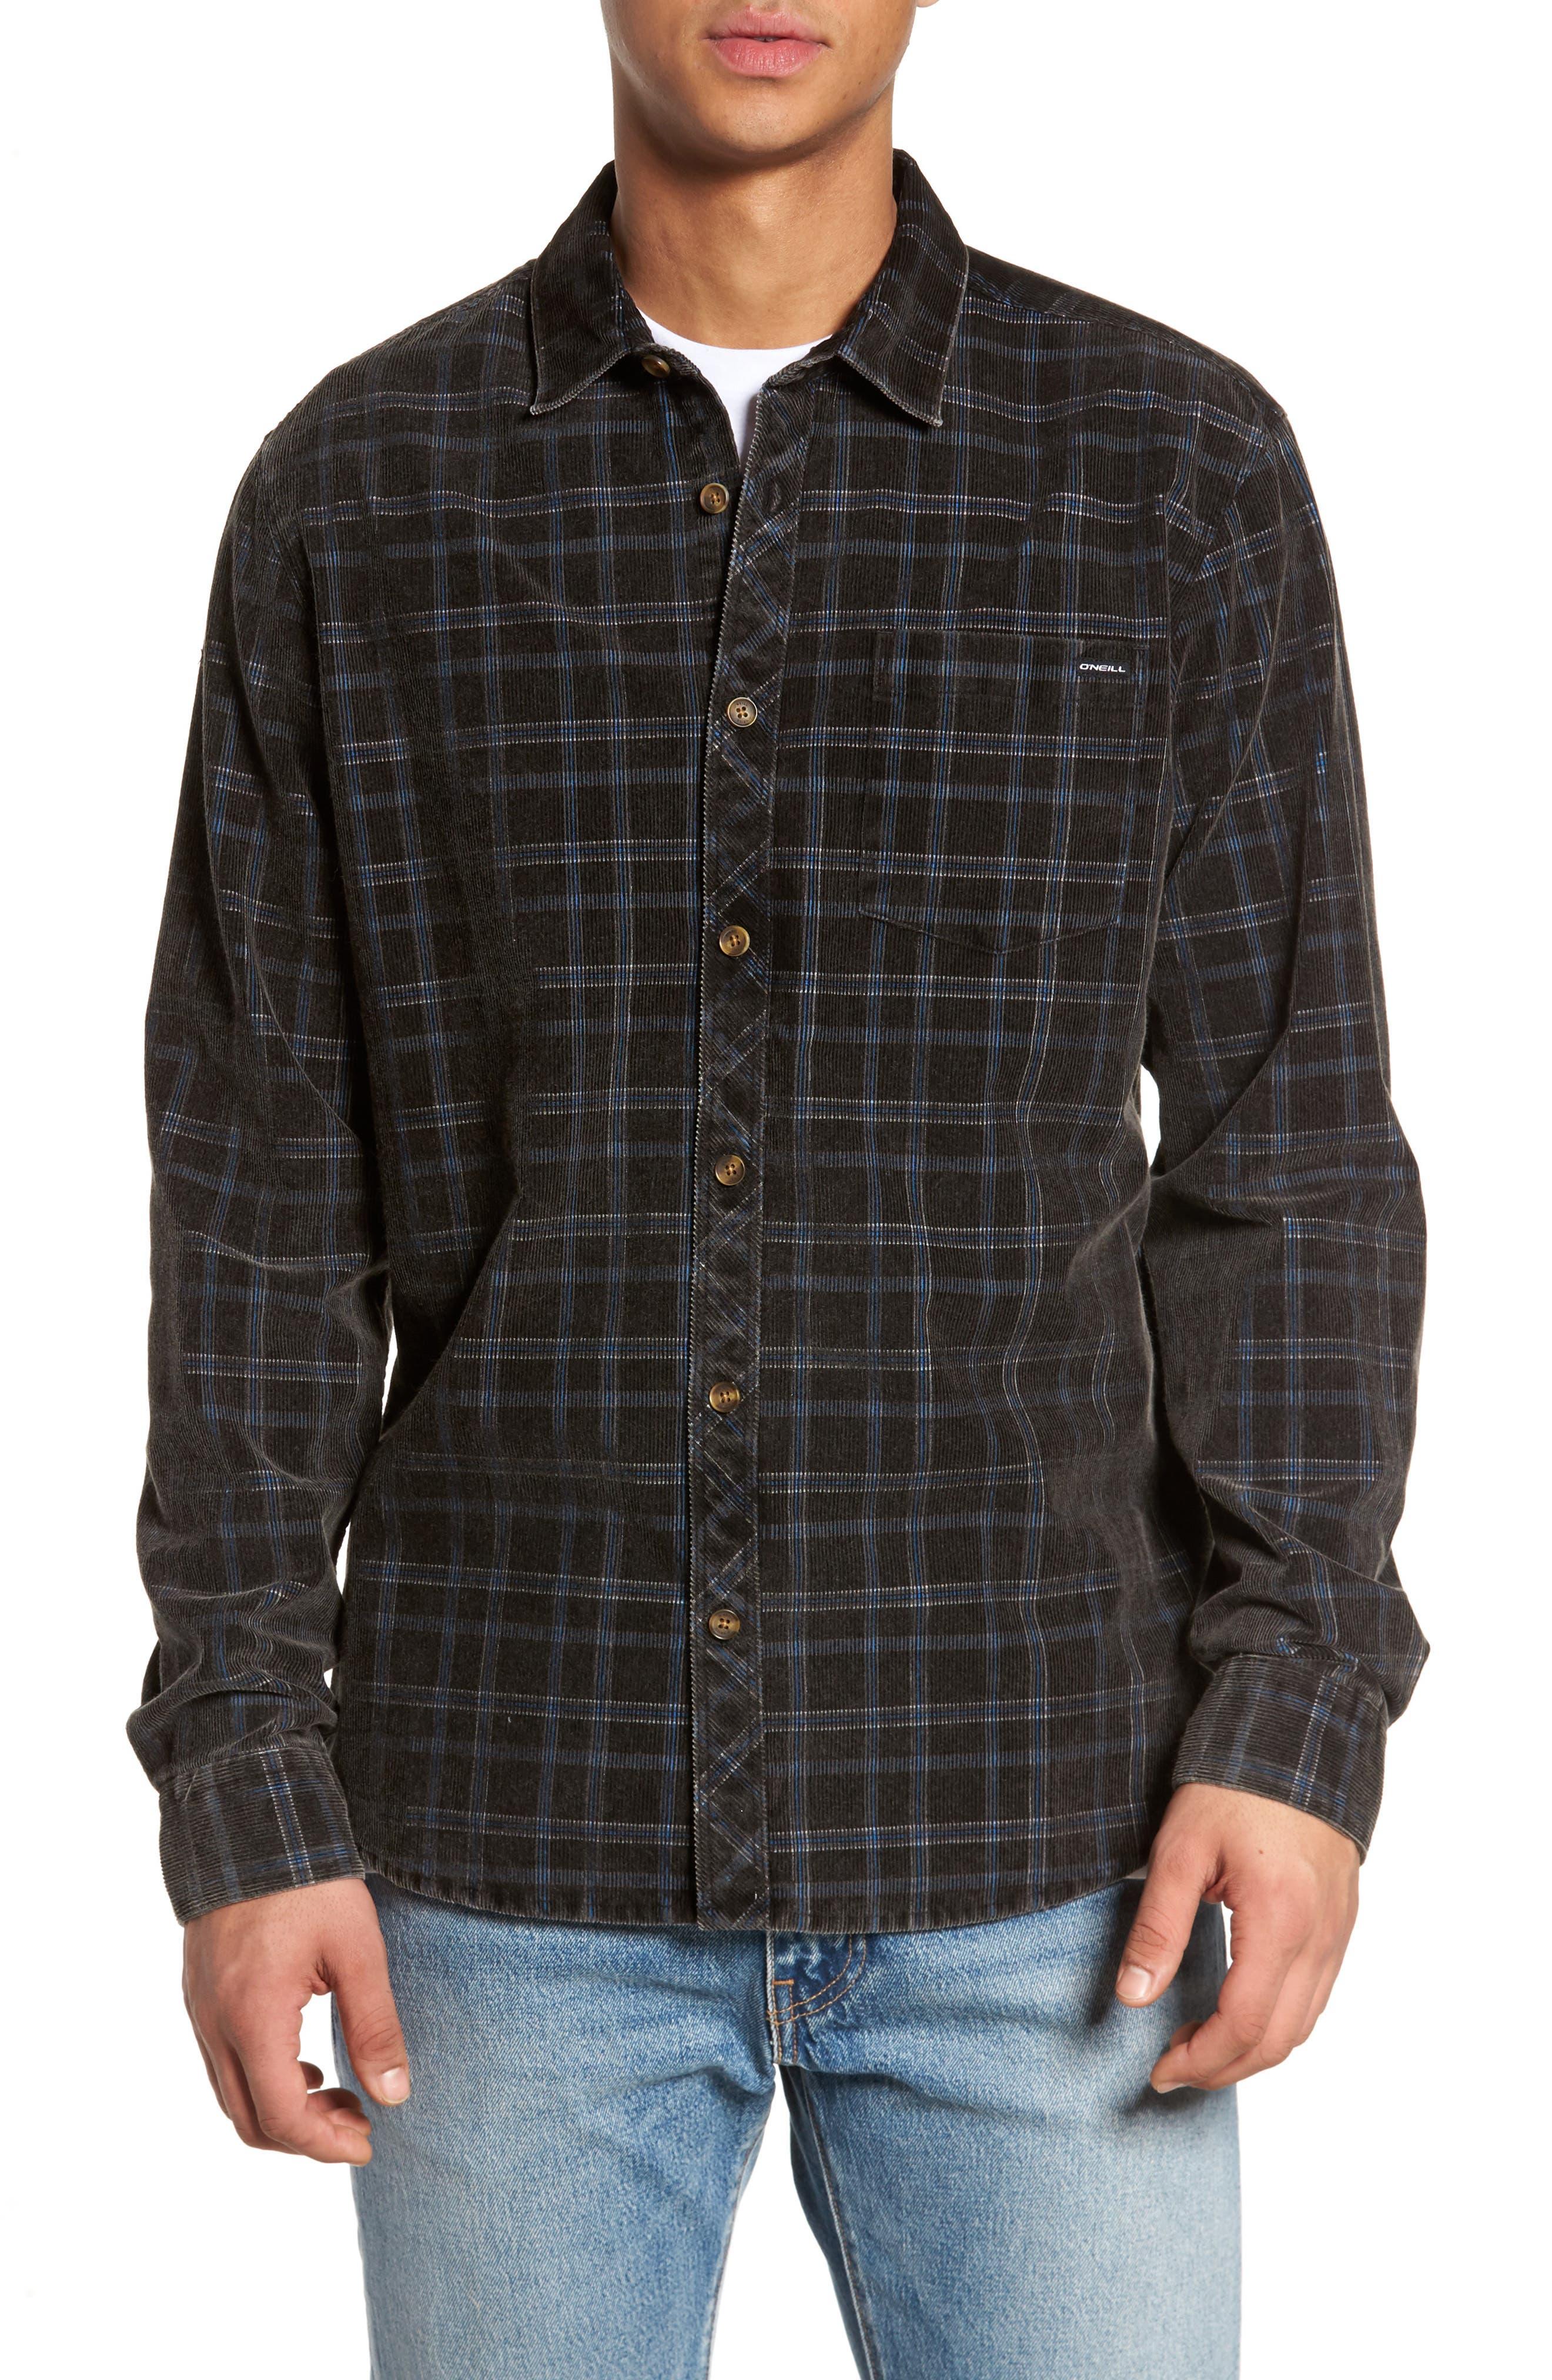 Bradley Corduroy Shirt,                         Main,                         color, Black